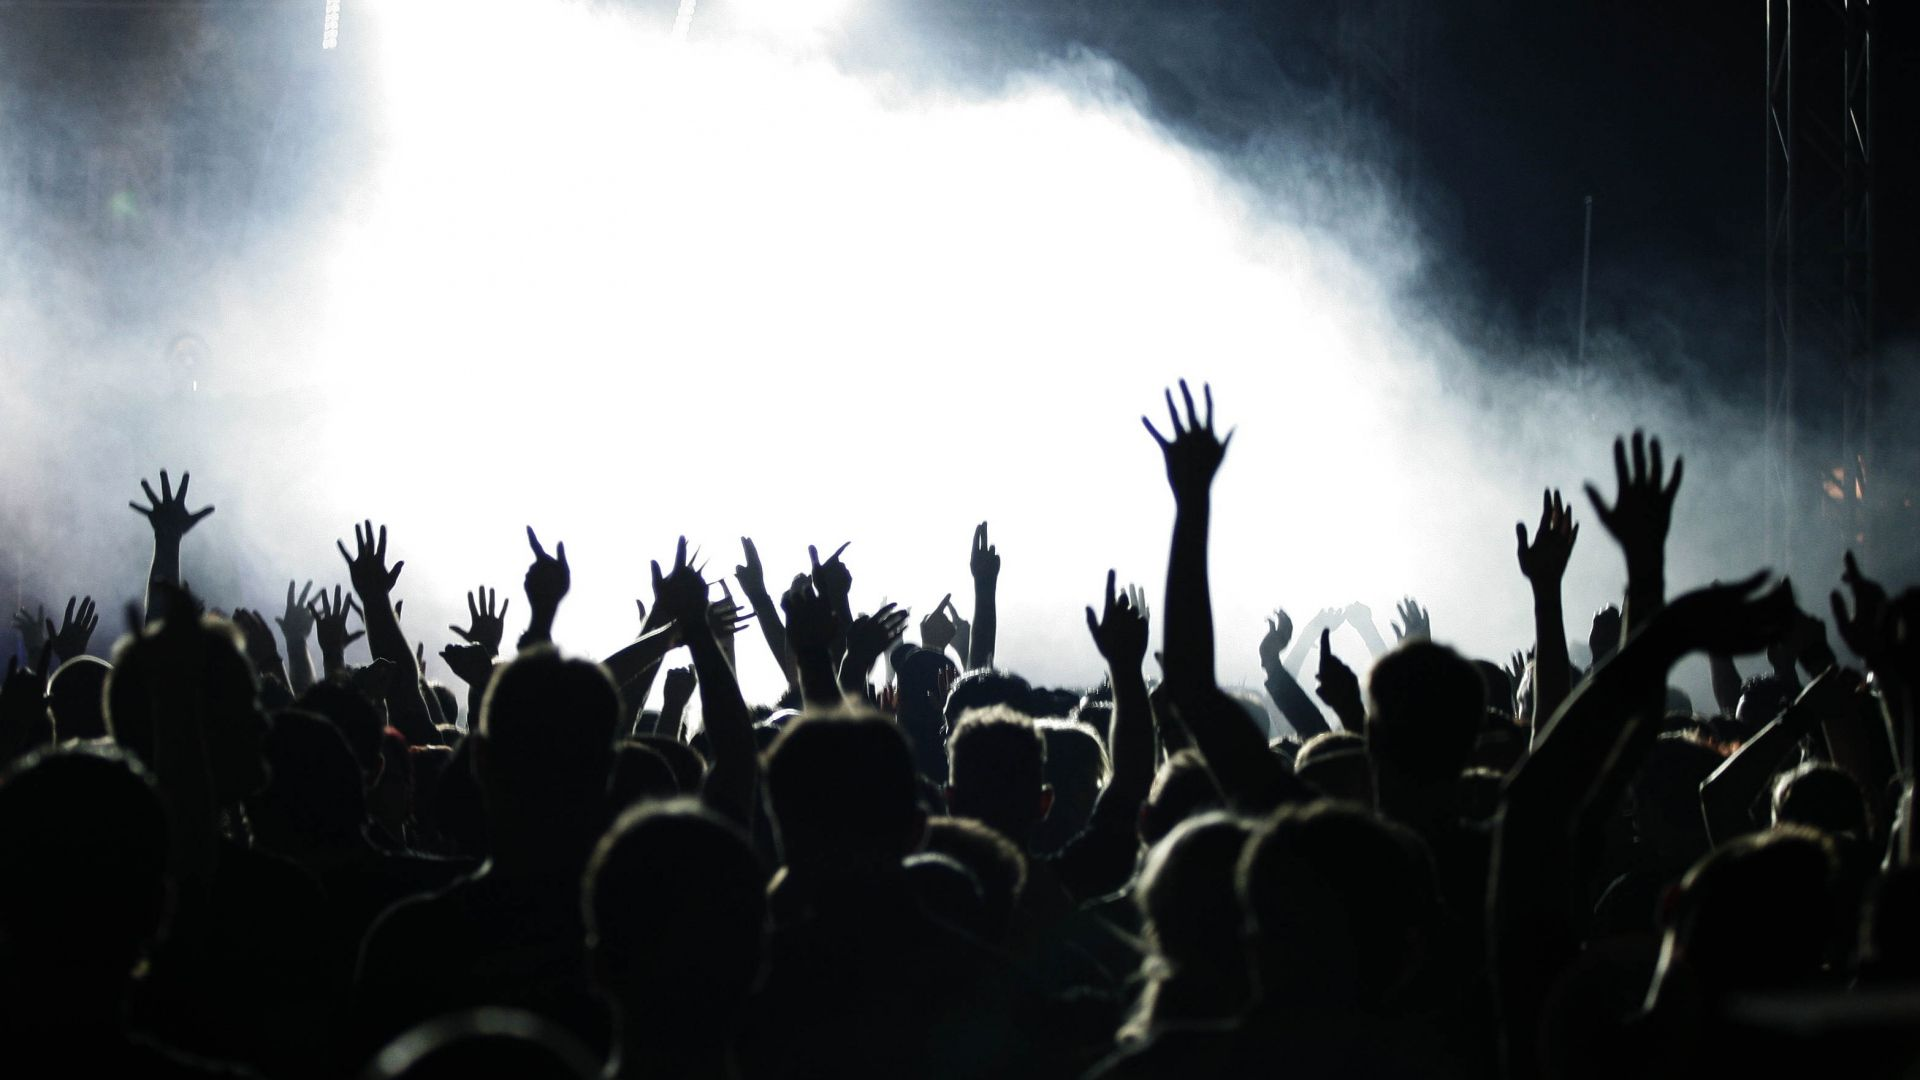 Download Wallpaper 1920x1080 People Hands Concert Music Crowd Full Hd 1080p Hd Background Concert Concert Crowd Music Wallpaper